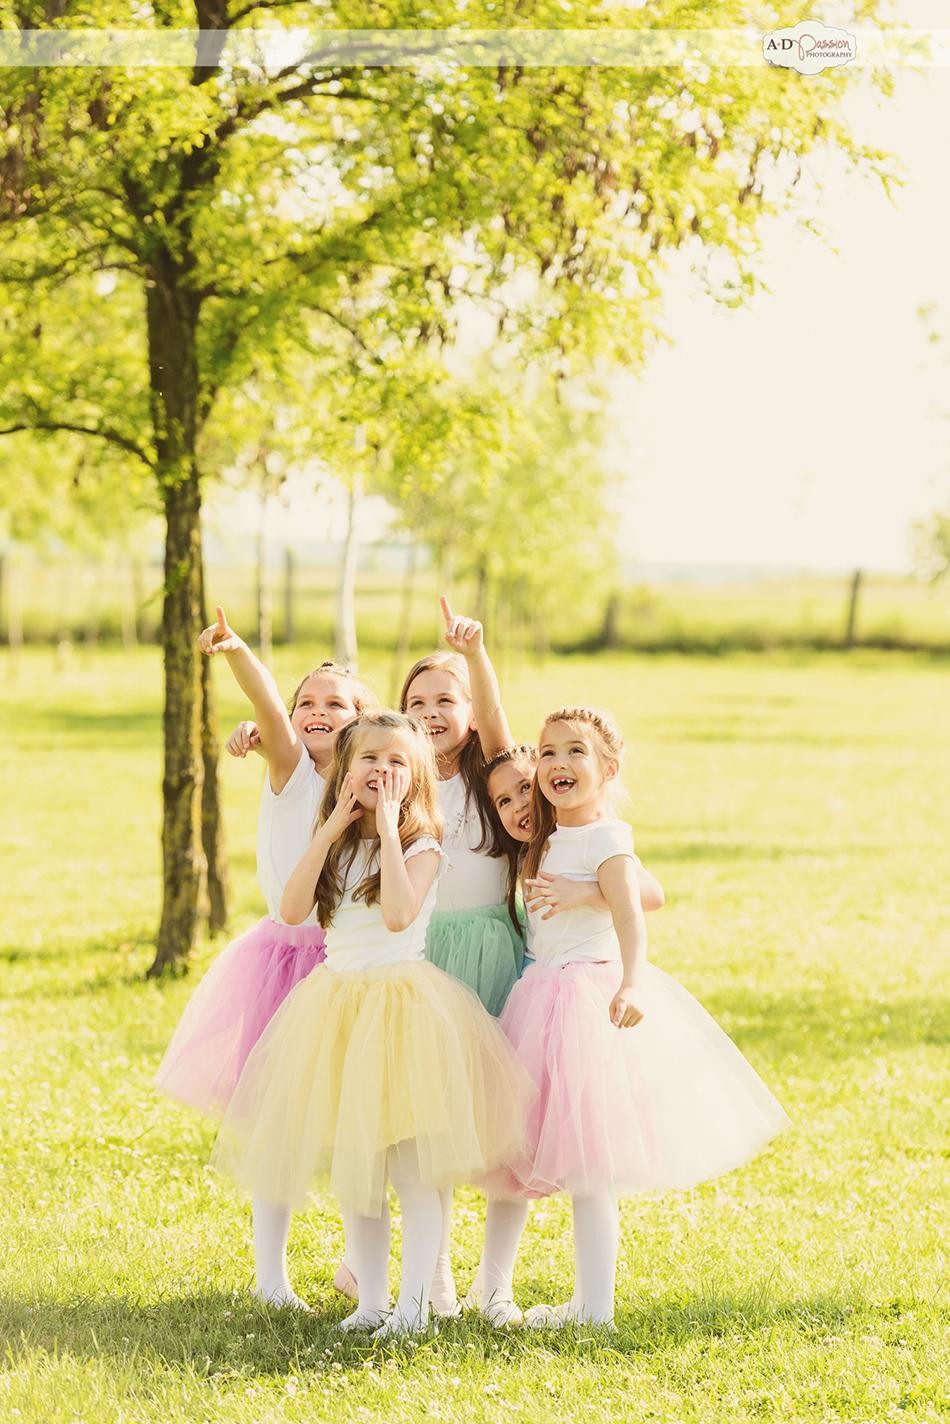 AD Passion Photography | party-fetite-fotograf-copii-timisoara_0013 | Adelin, Dida, fotograf profesionist, fotograf de nunta, fotografie de nunta, fotograf Timisoara, fotograf Craiova, fotograf Bucuresti, fotograf Arad, nunta Timisoara, nunta Arad, nunta Bucuresti, nunta Craiova